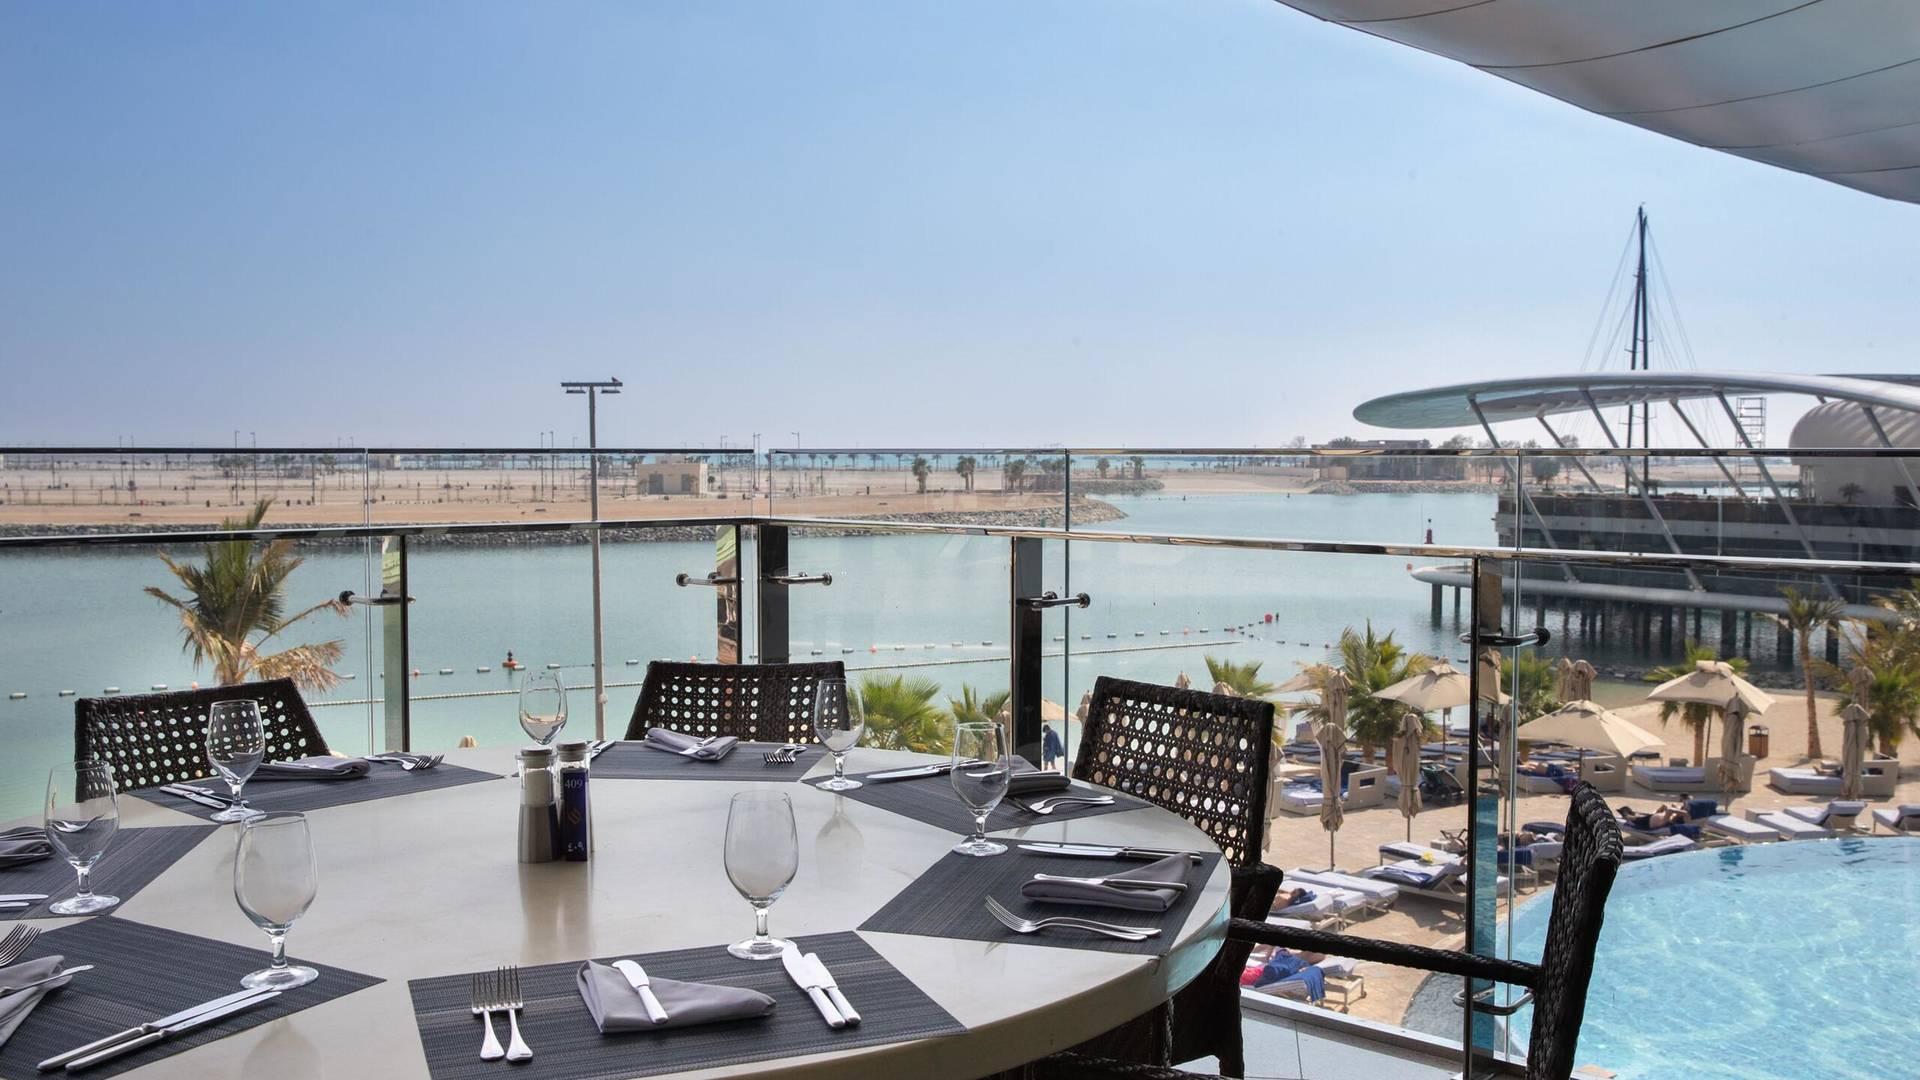 etihad tower poolside lunch abu dhabi